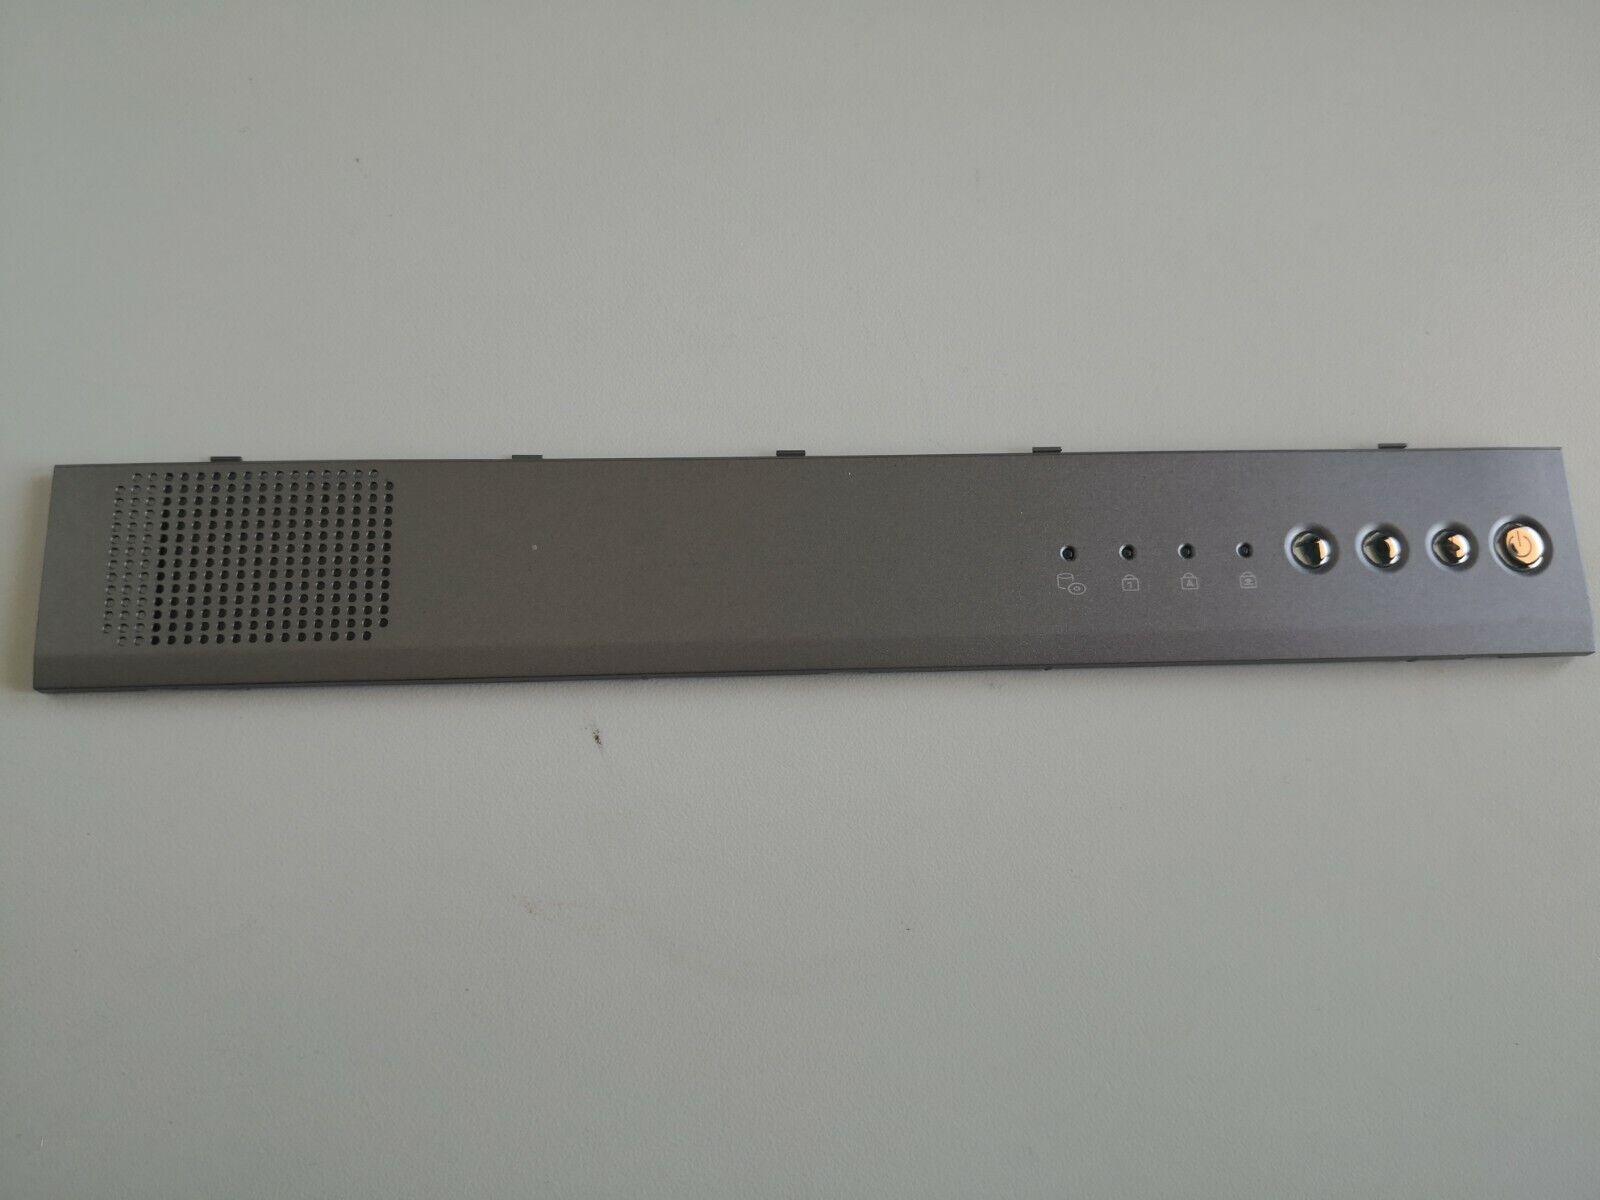 Housing Sup. Bar LED Ignition For Fujitsu Amilo D 1845 (3083T)